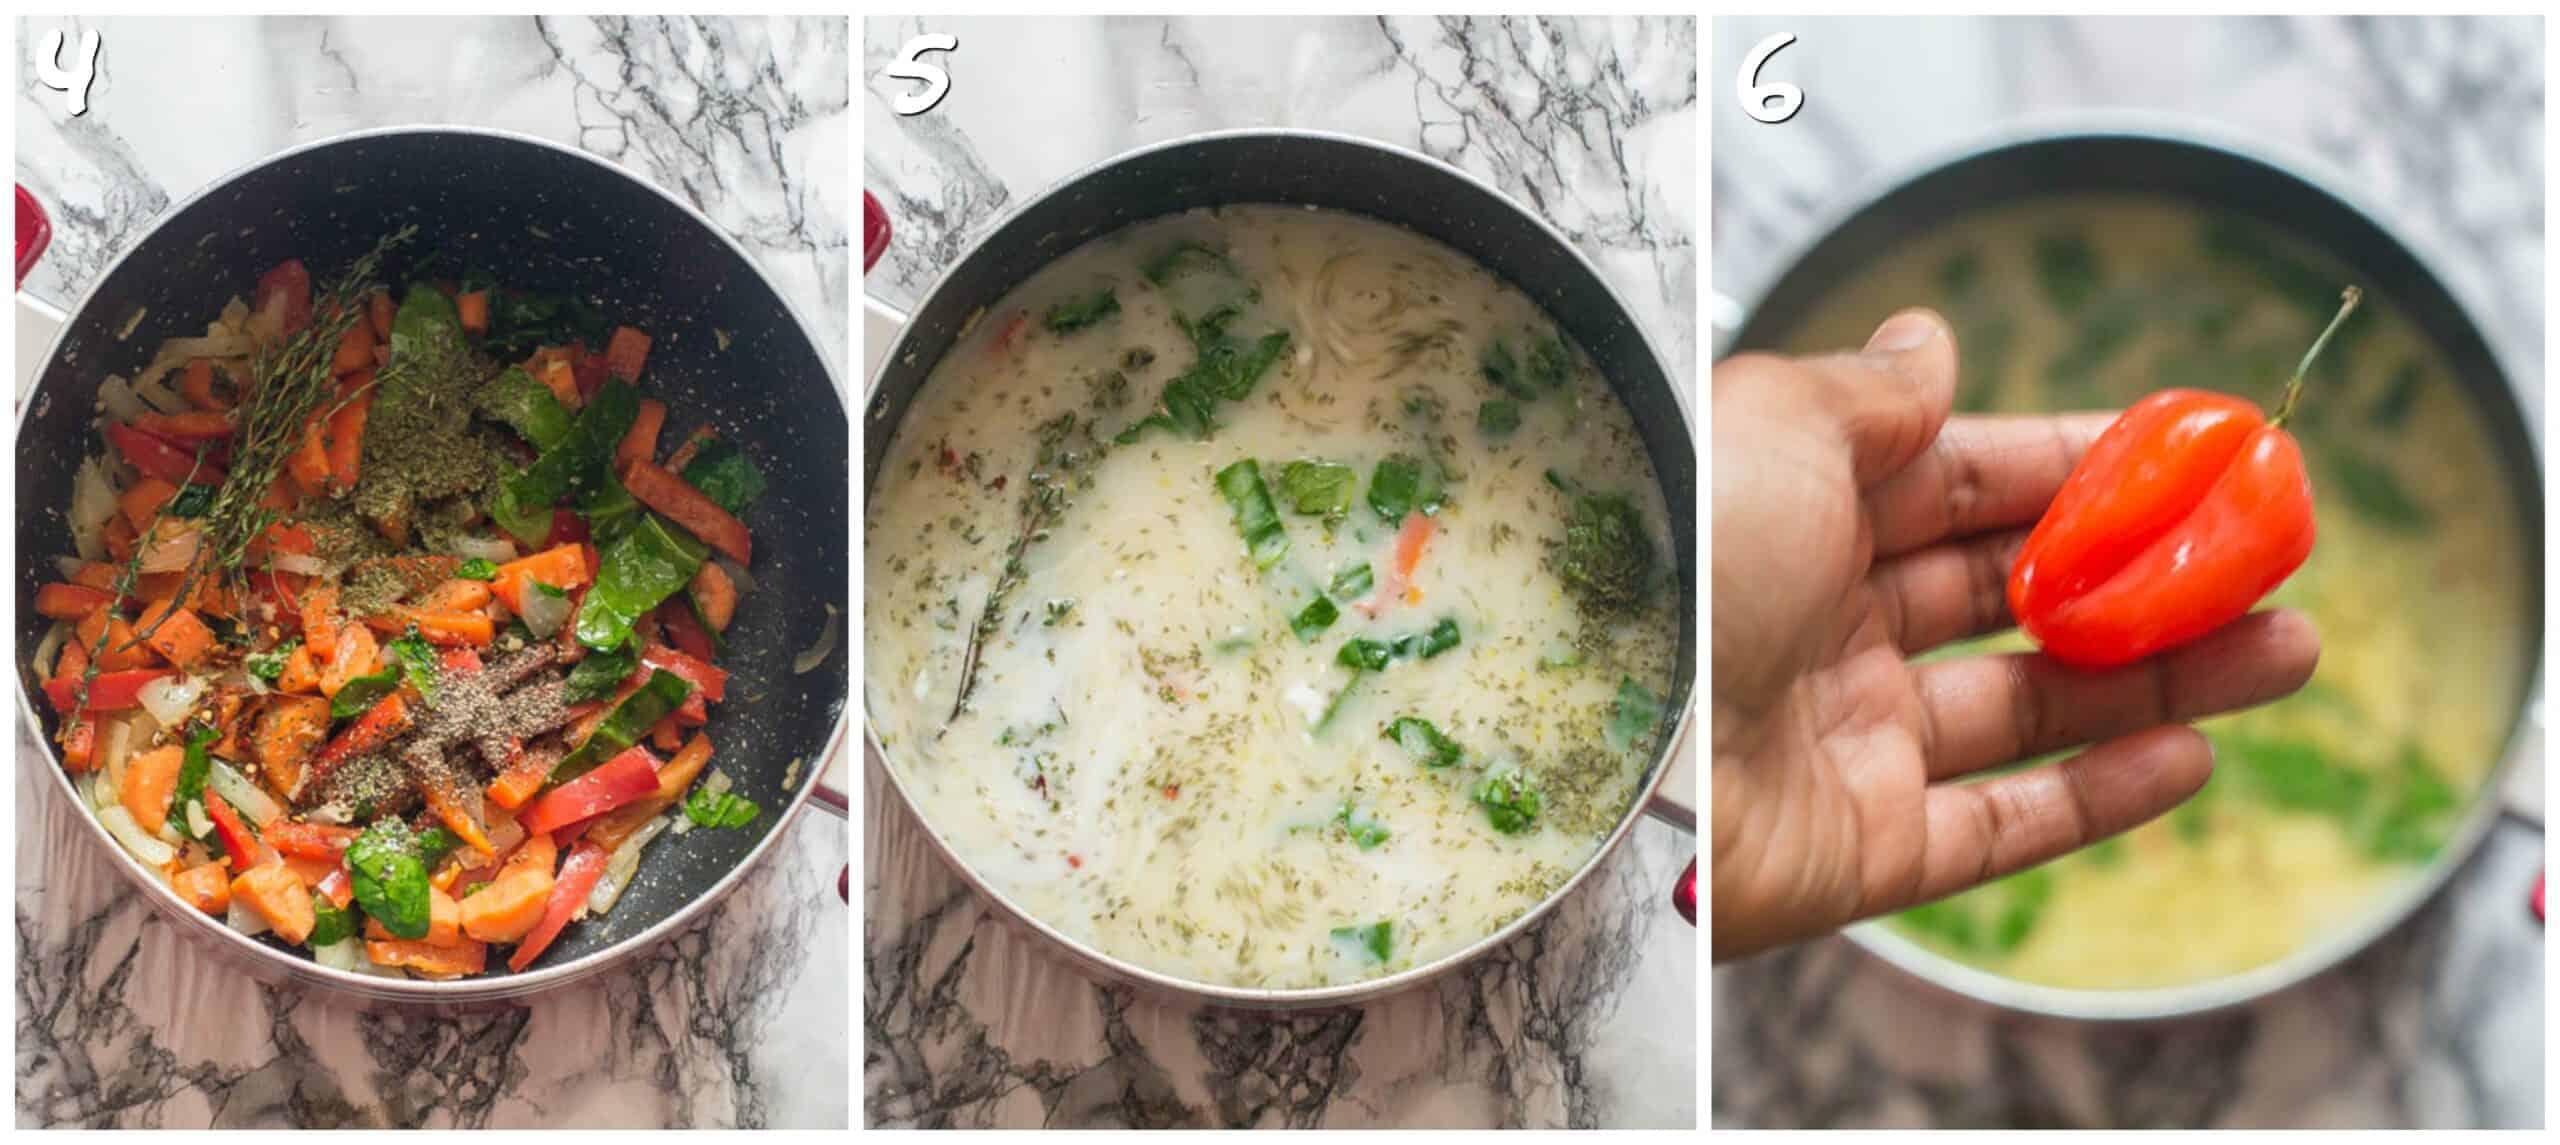 steps 3-6 vegetables and milk added